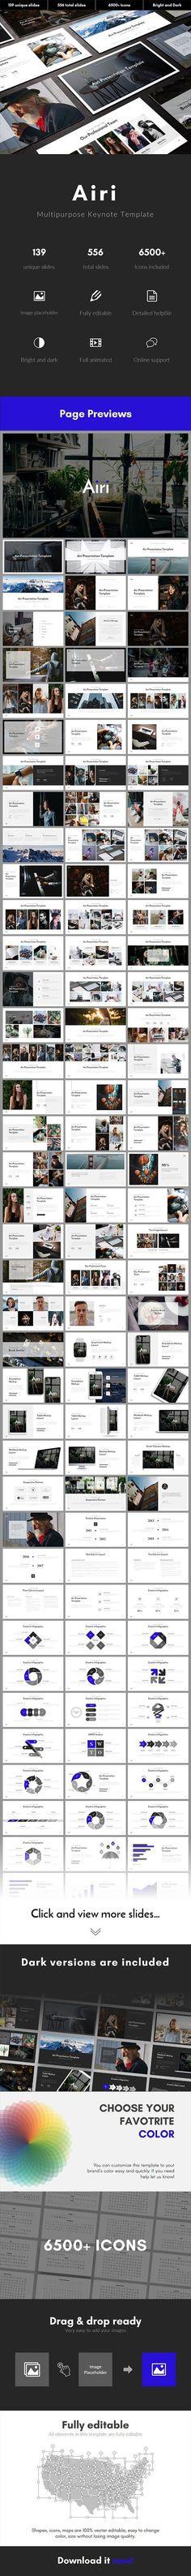 Airi Multipurpose Keynote Template - Keynote Business Presentation Template by Jiani_design. Business Presentation Templates, Presentation Design Template, Business Templates, Presentation Slides, Design Templates, Slide Background, New Bus, Slide Design, Google